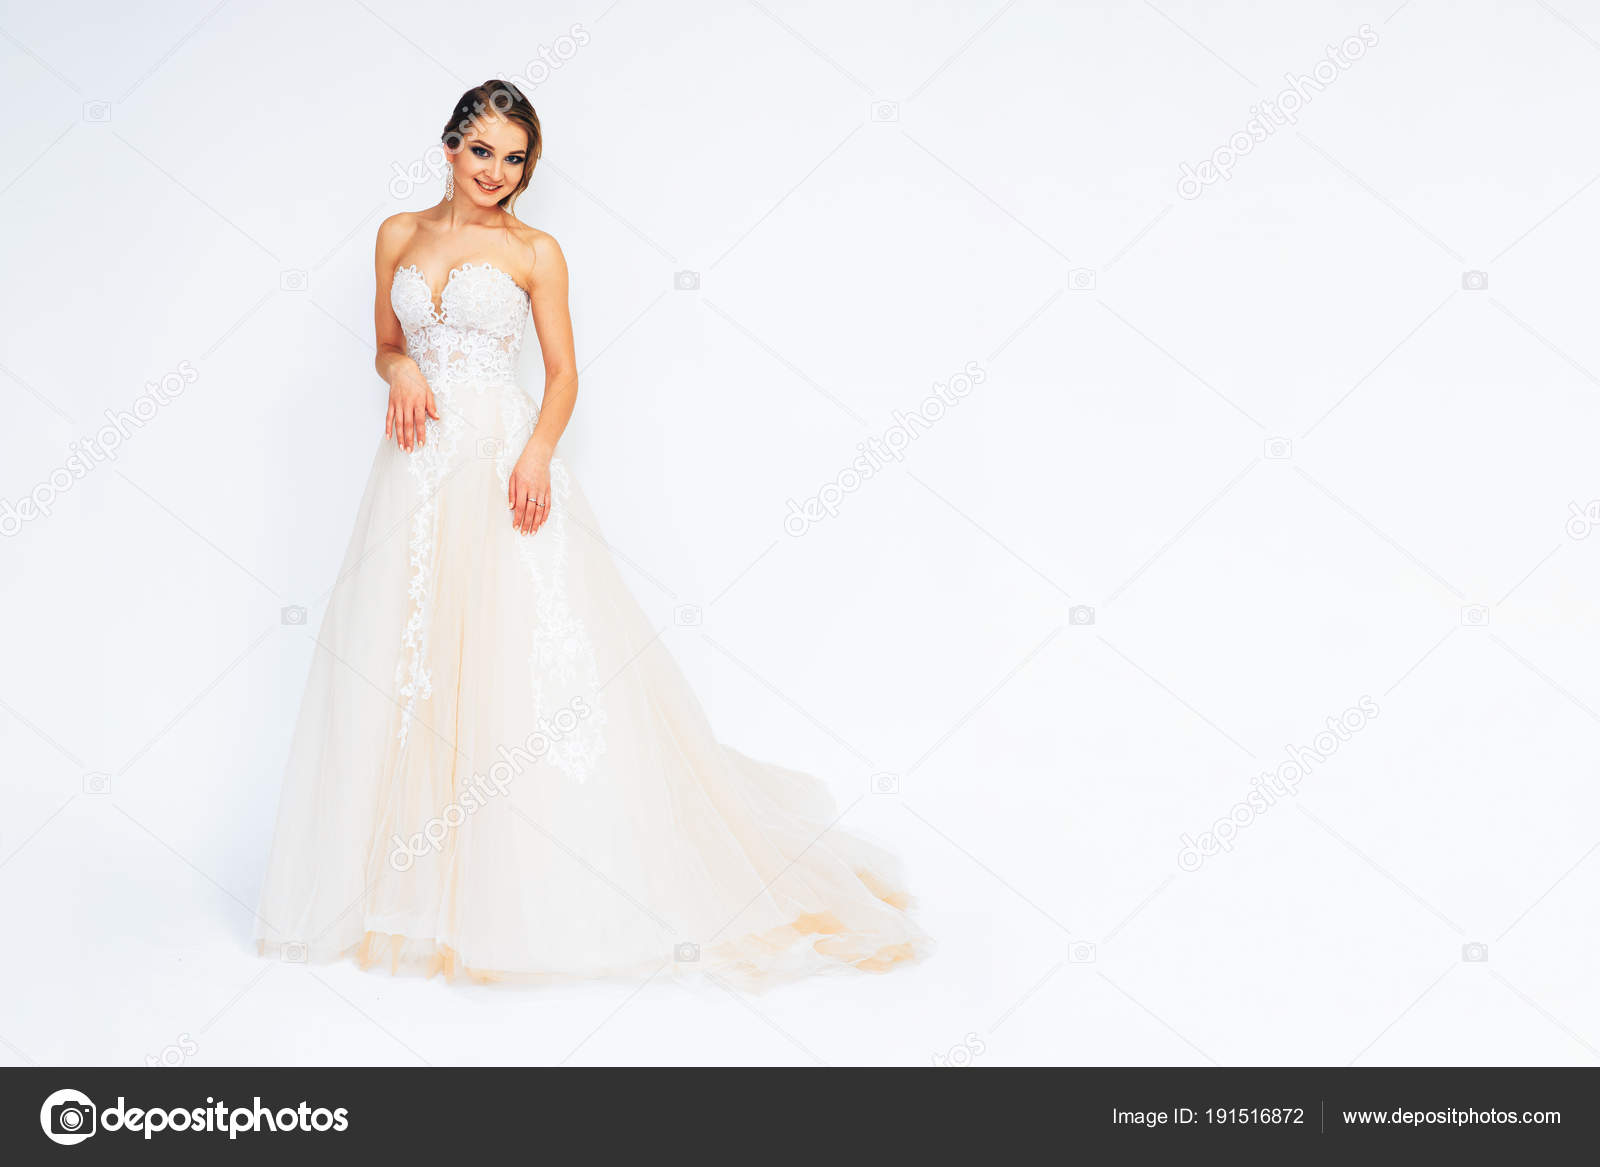 Fein Vestido De Novia Jahrgang Bilder - Brautkleider Ideen ...